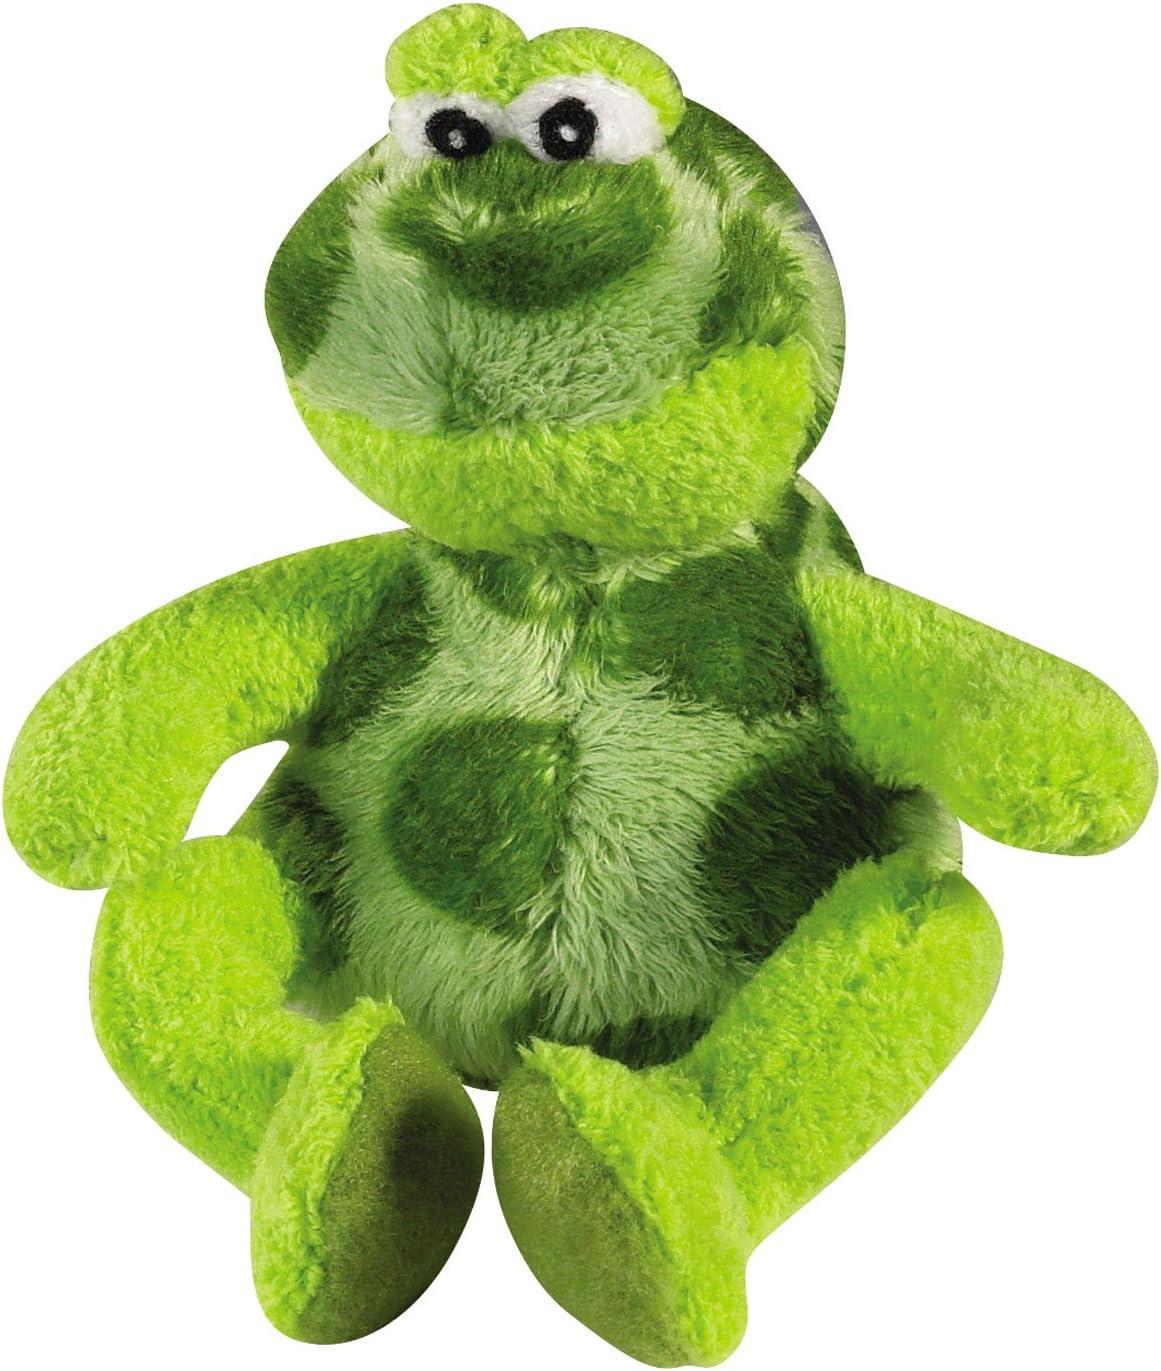 Zanies Plush Croaker Pet Toy